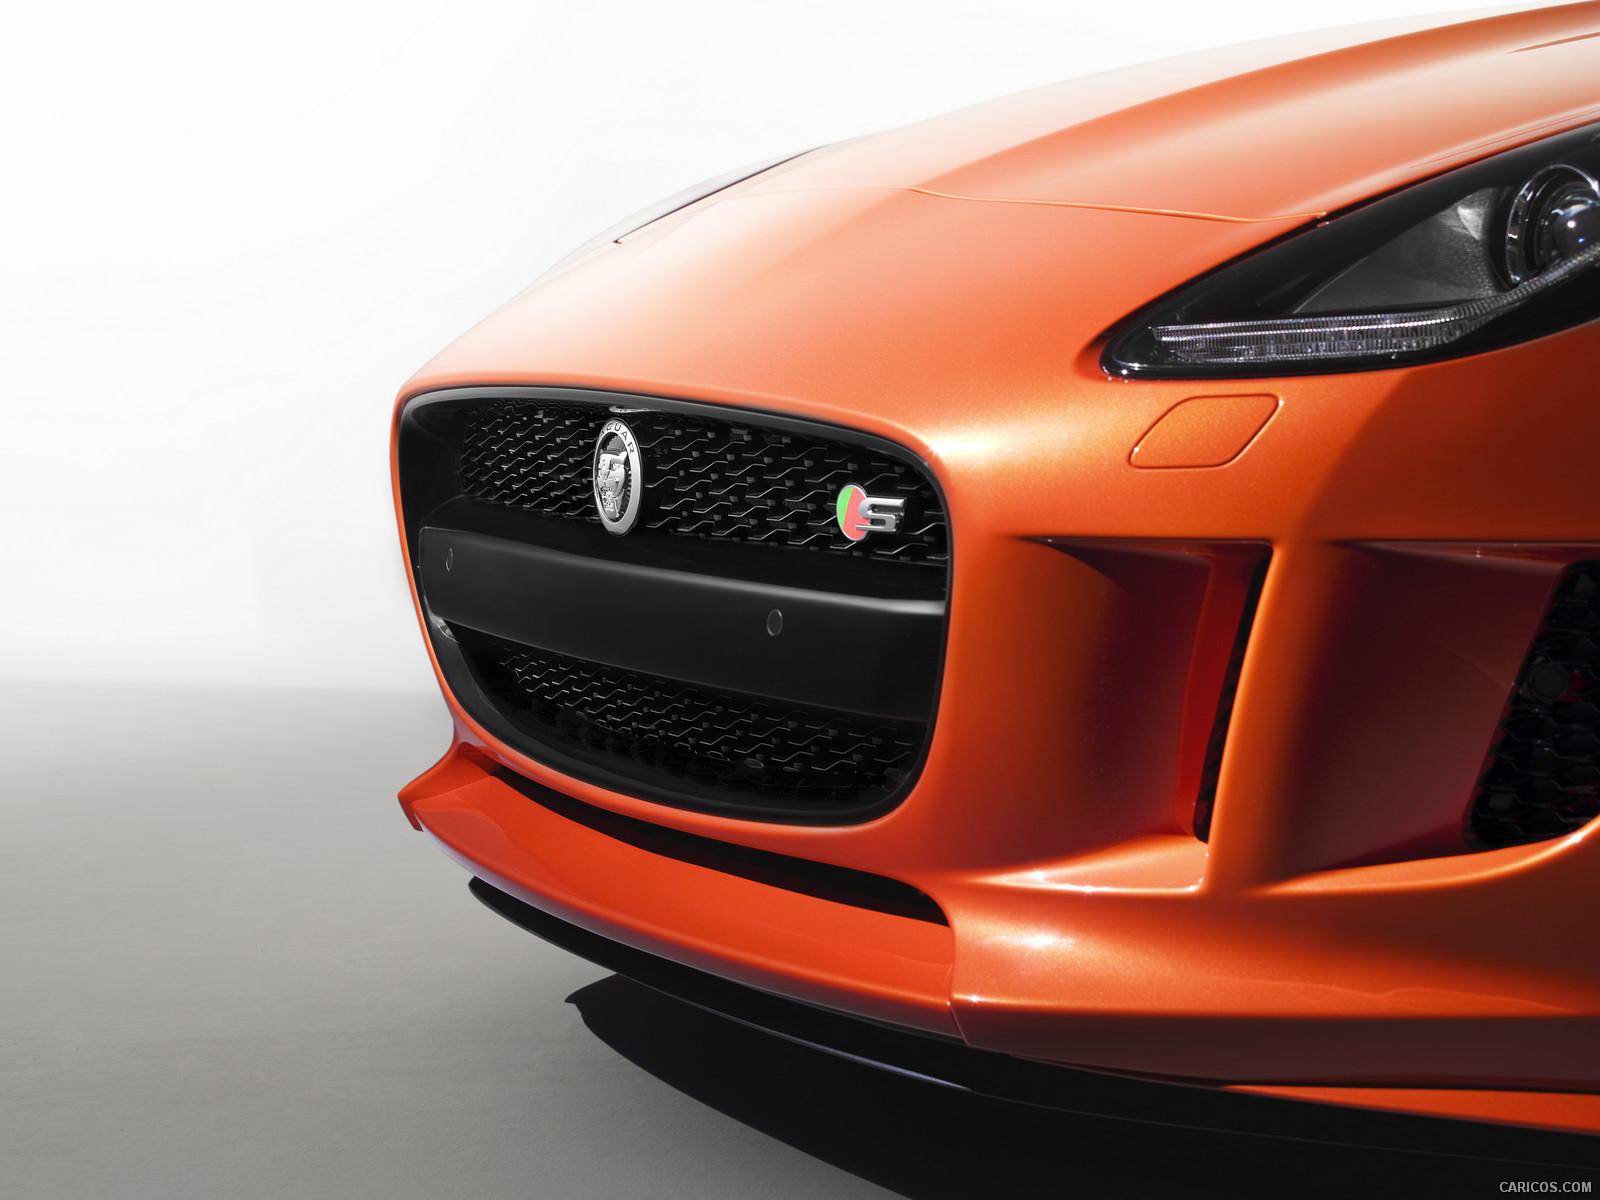 2014 Jaguar F-TYPE - Grill Wallpaper